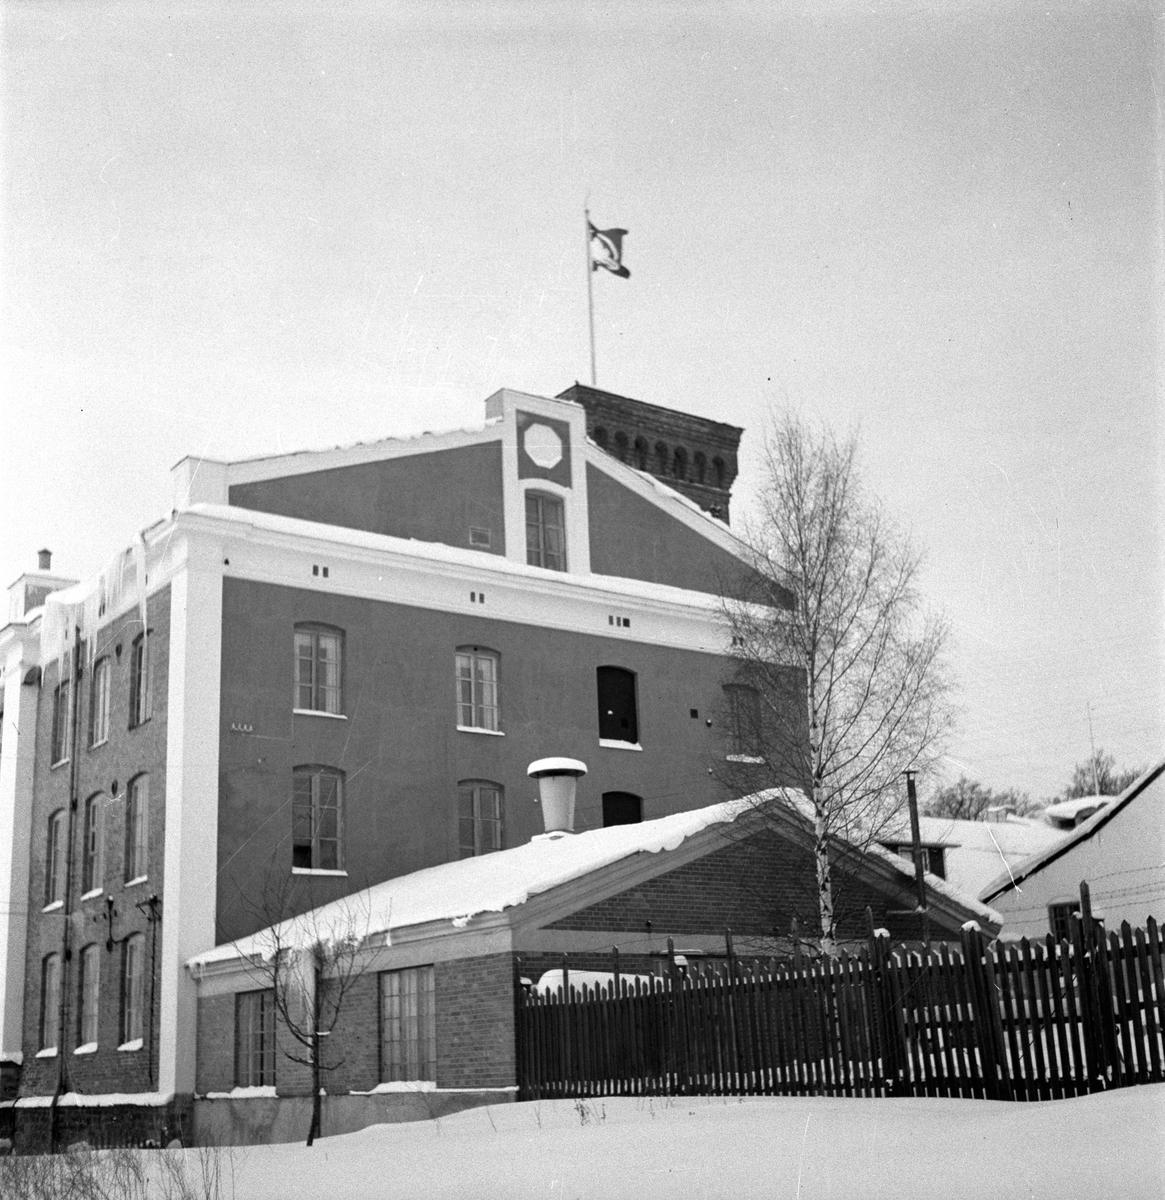 Gävle Manufaktur Svanen, Strömsbro i vinterskrud. 15 januari 1950.